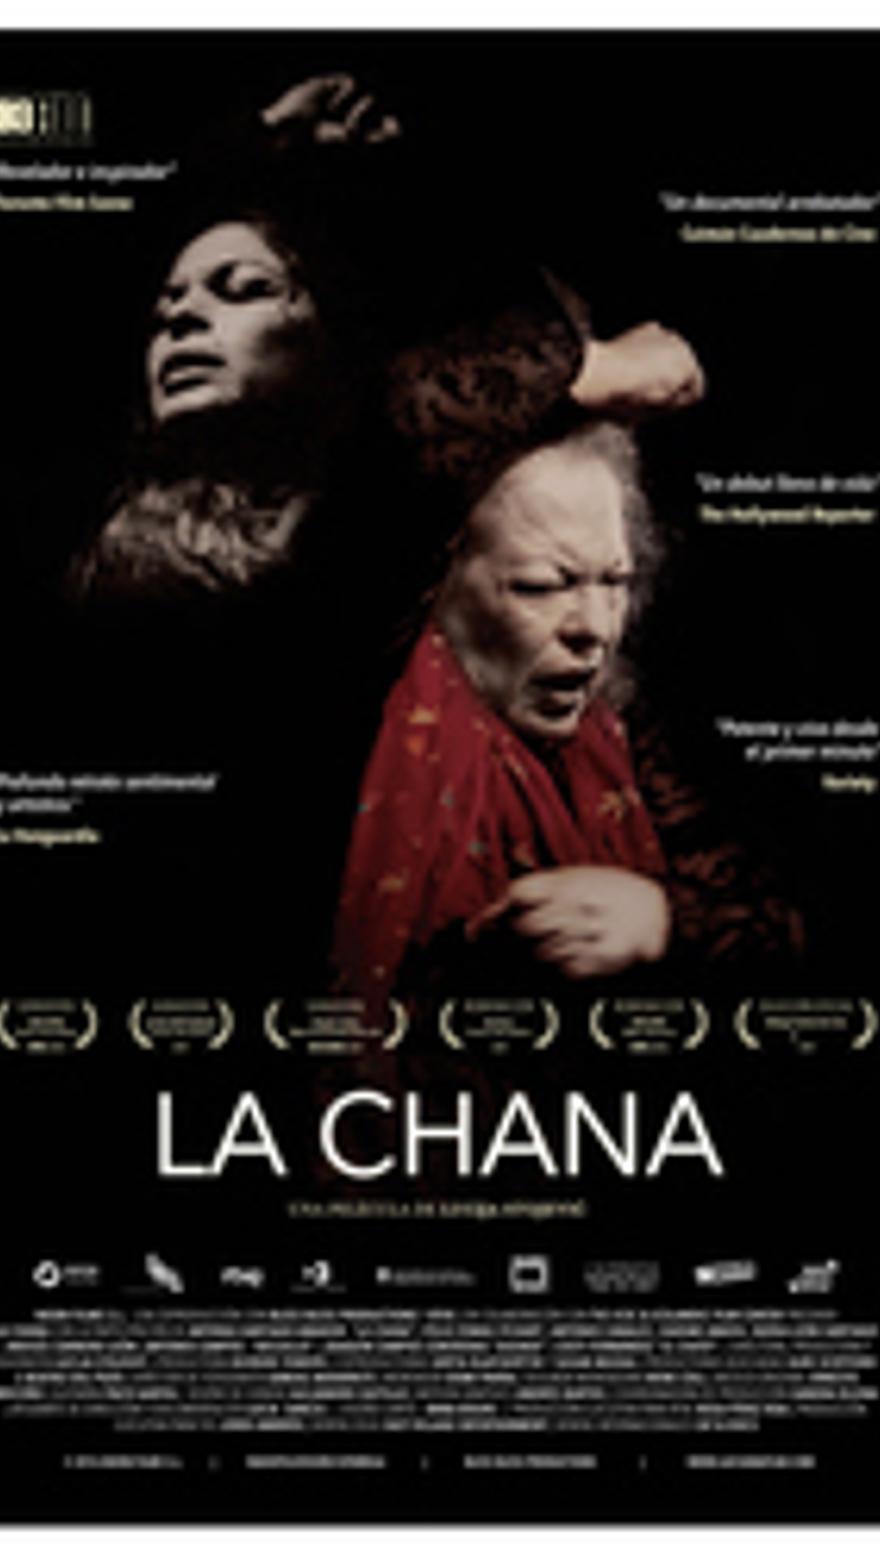 La Chana